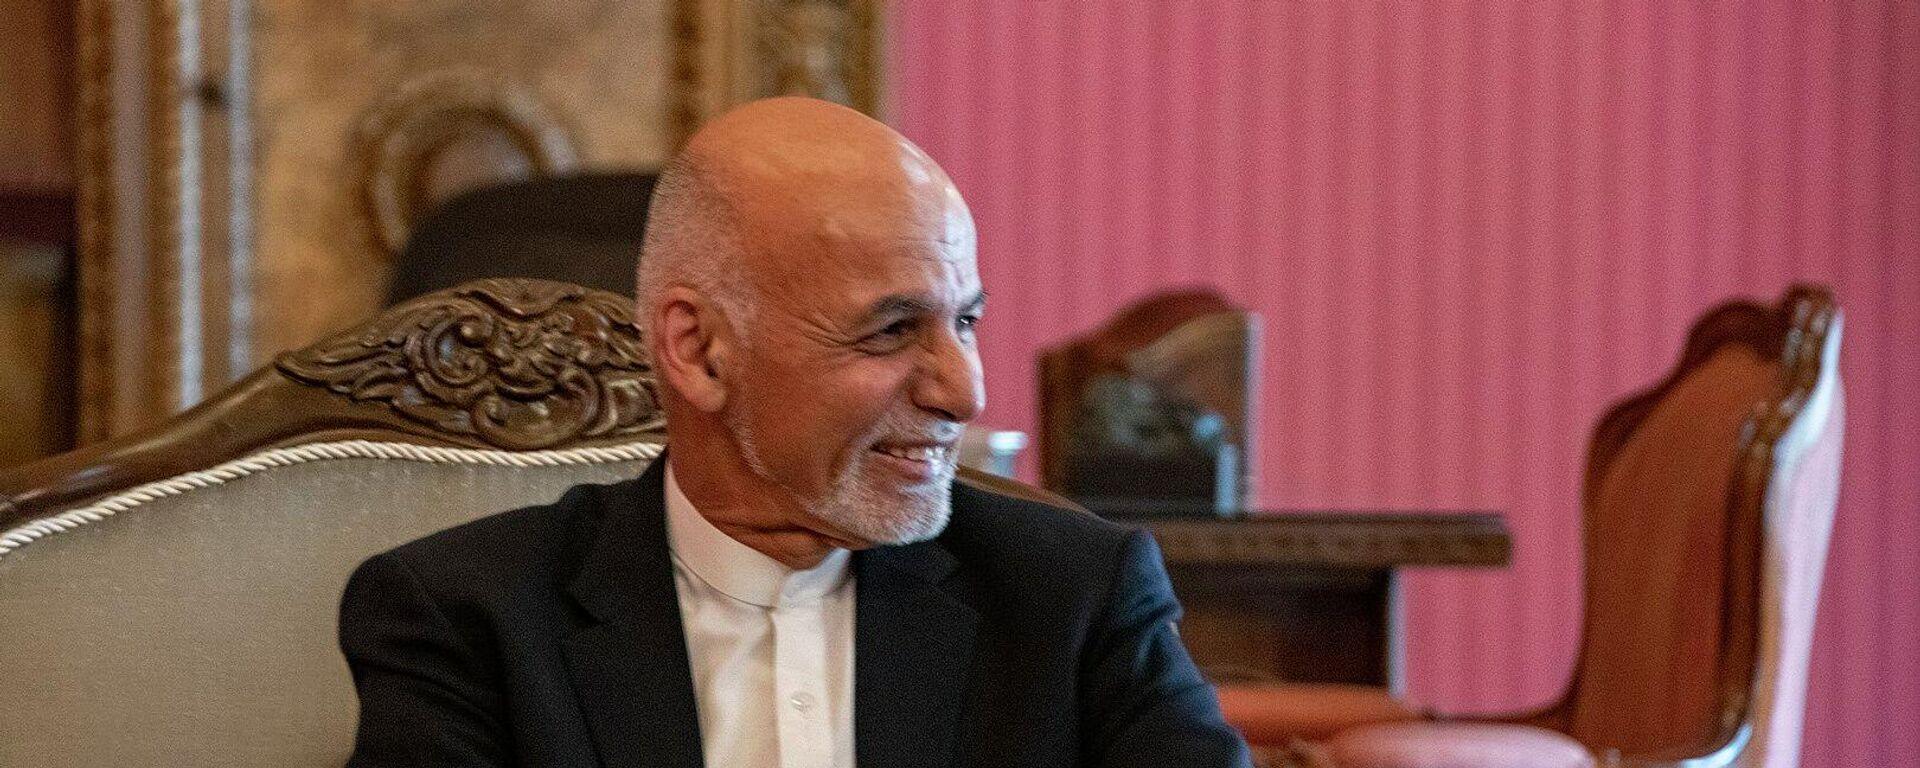 Afghanistans Präsident Ashraf Ghani - SNA, 1920, 03.10.2021